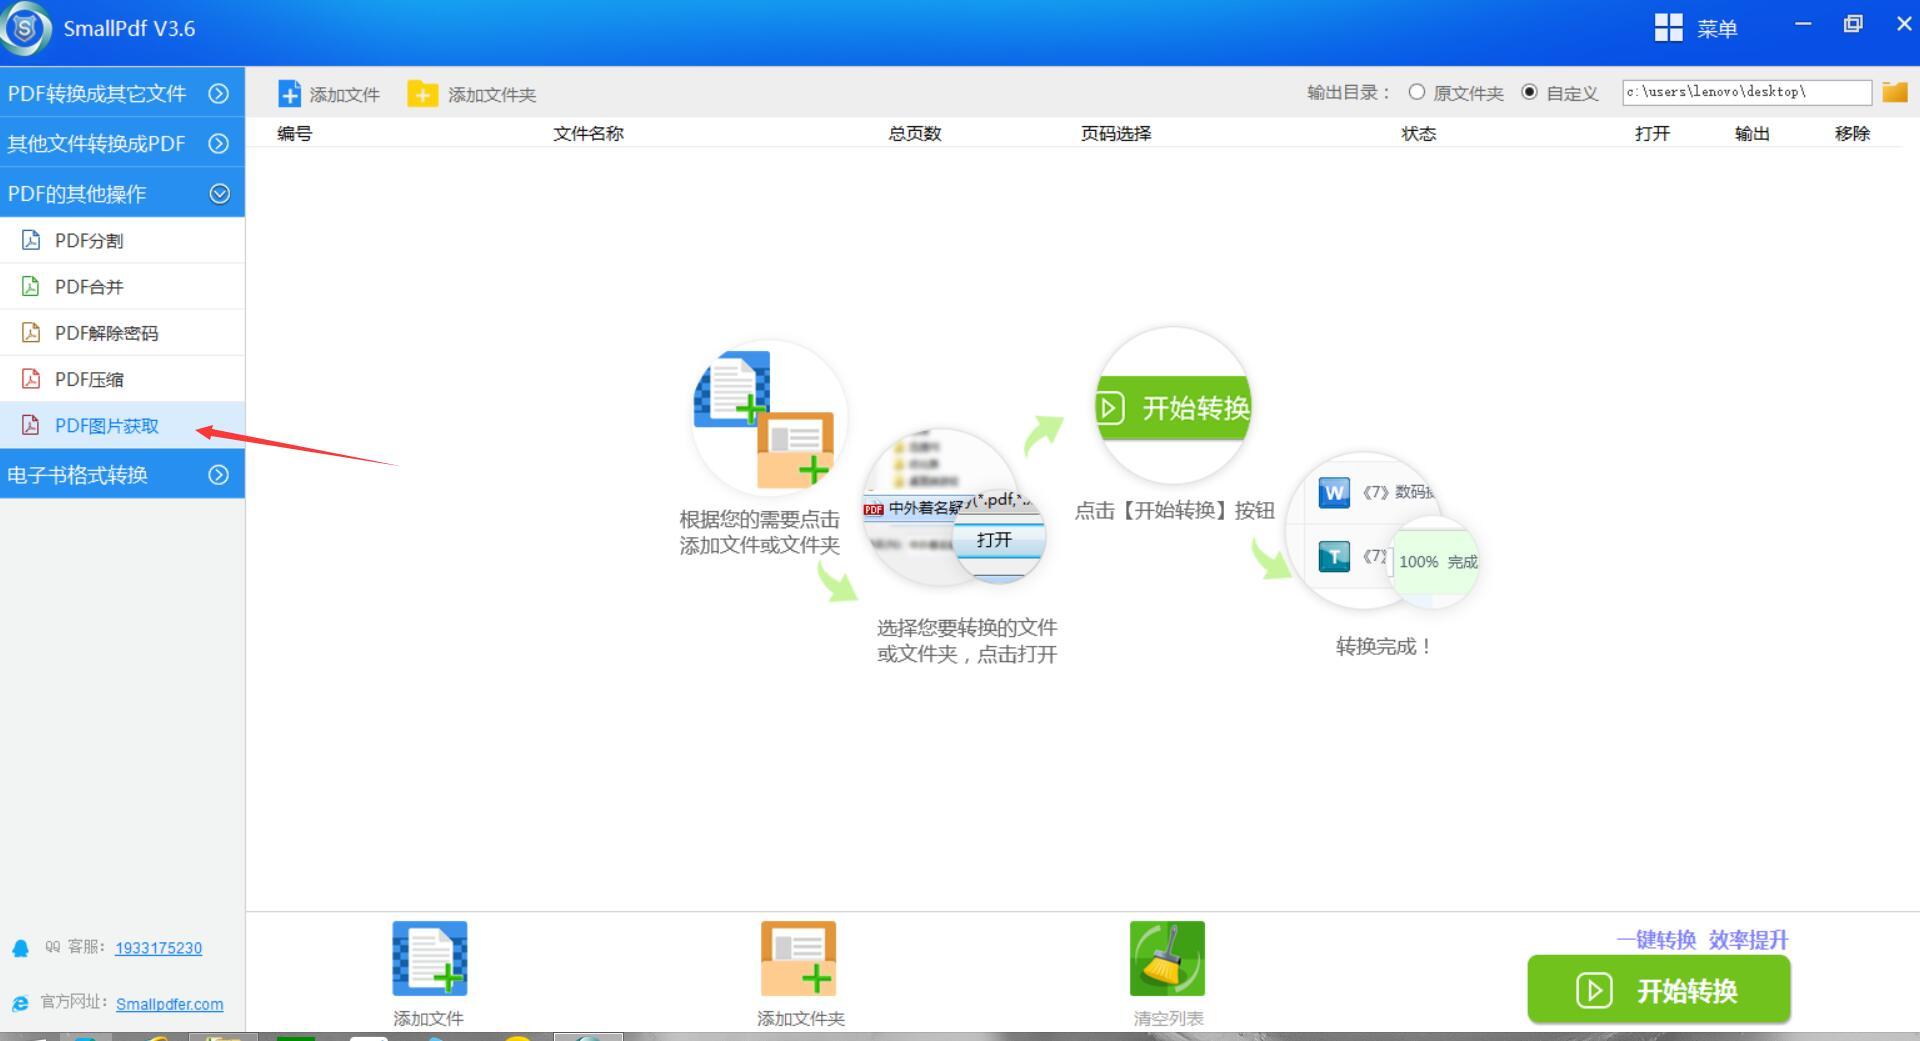 Small PDF转换成JPG软件PDF图片获取操作-2